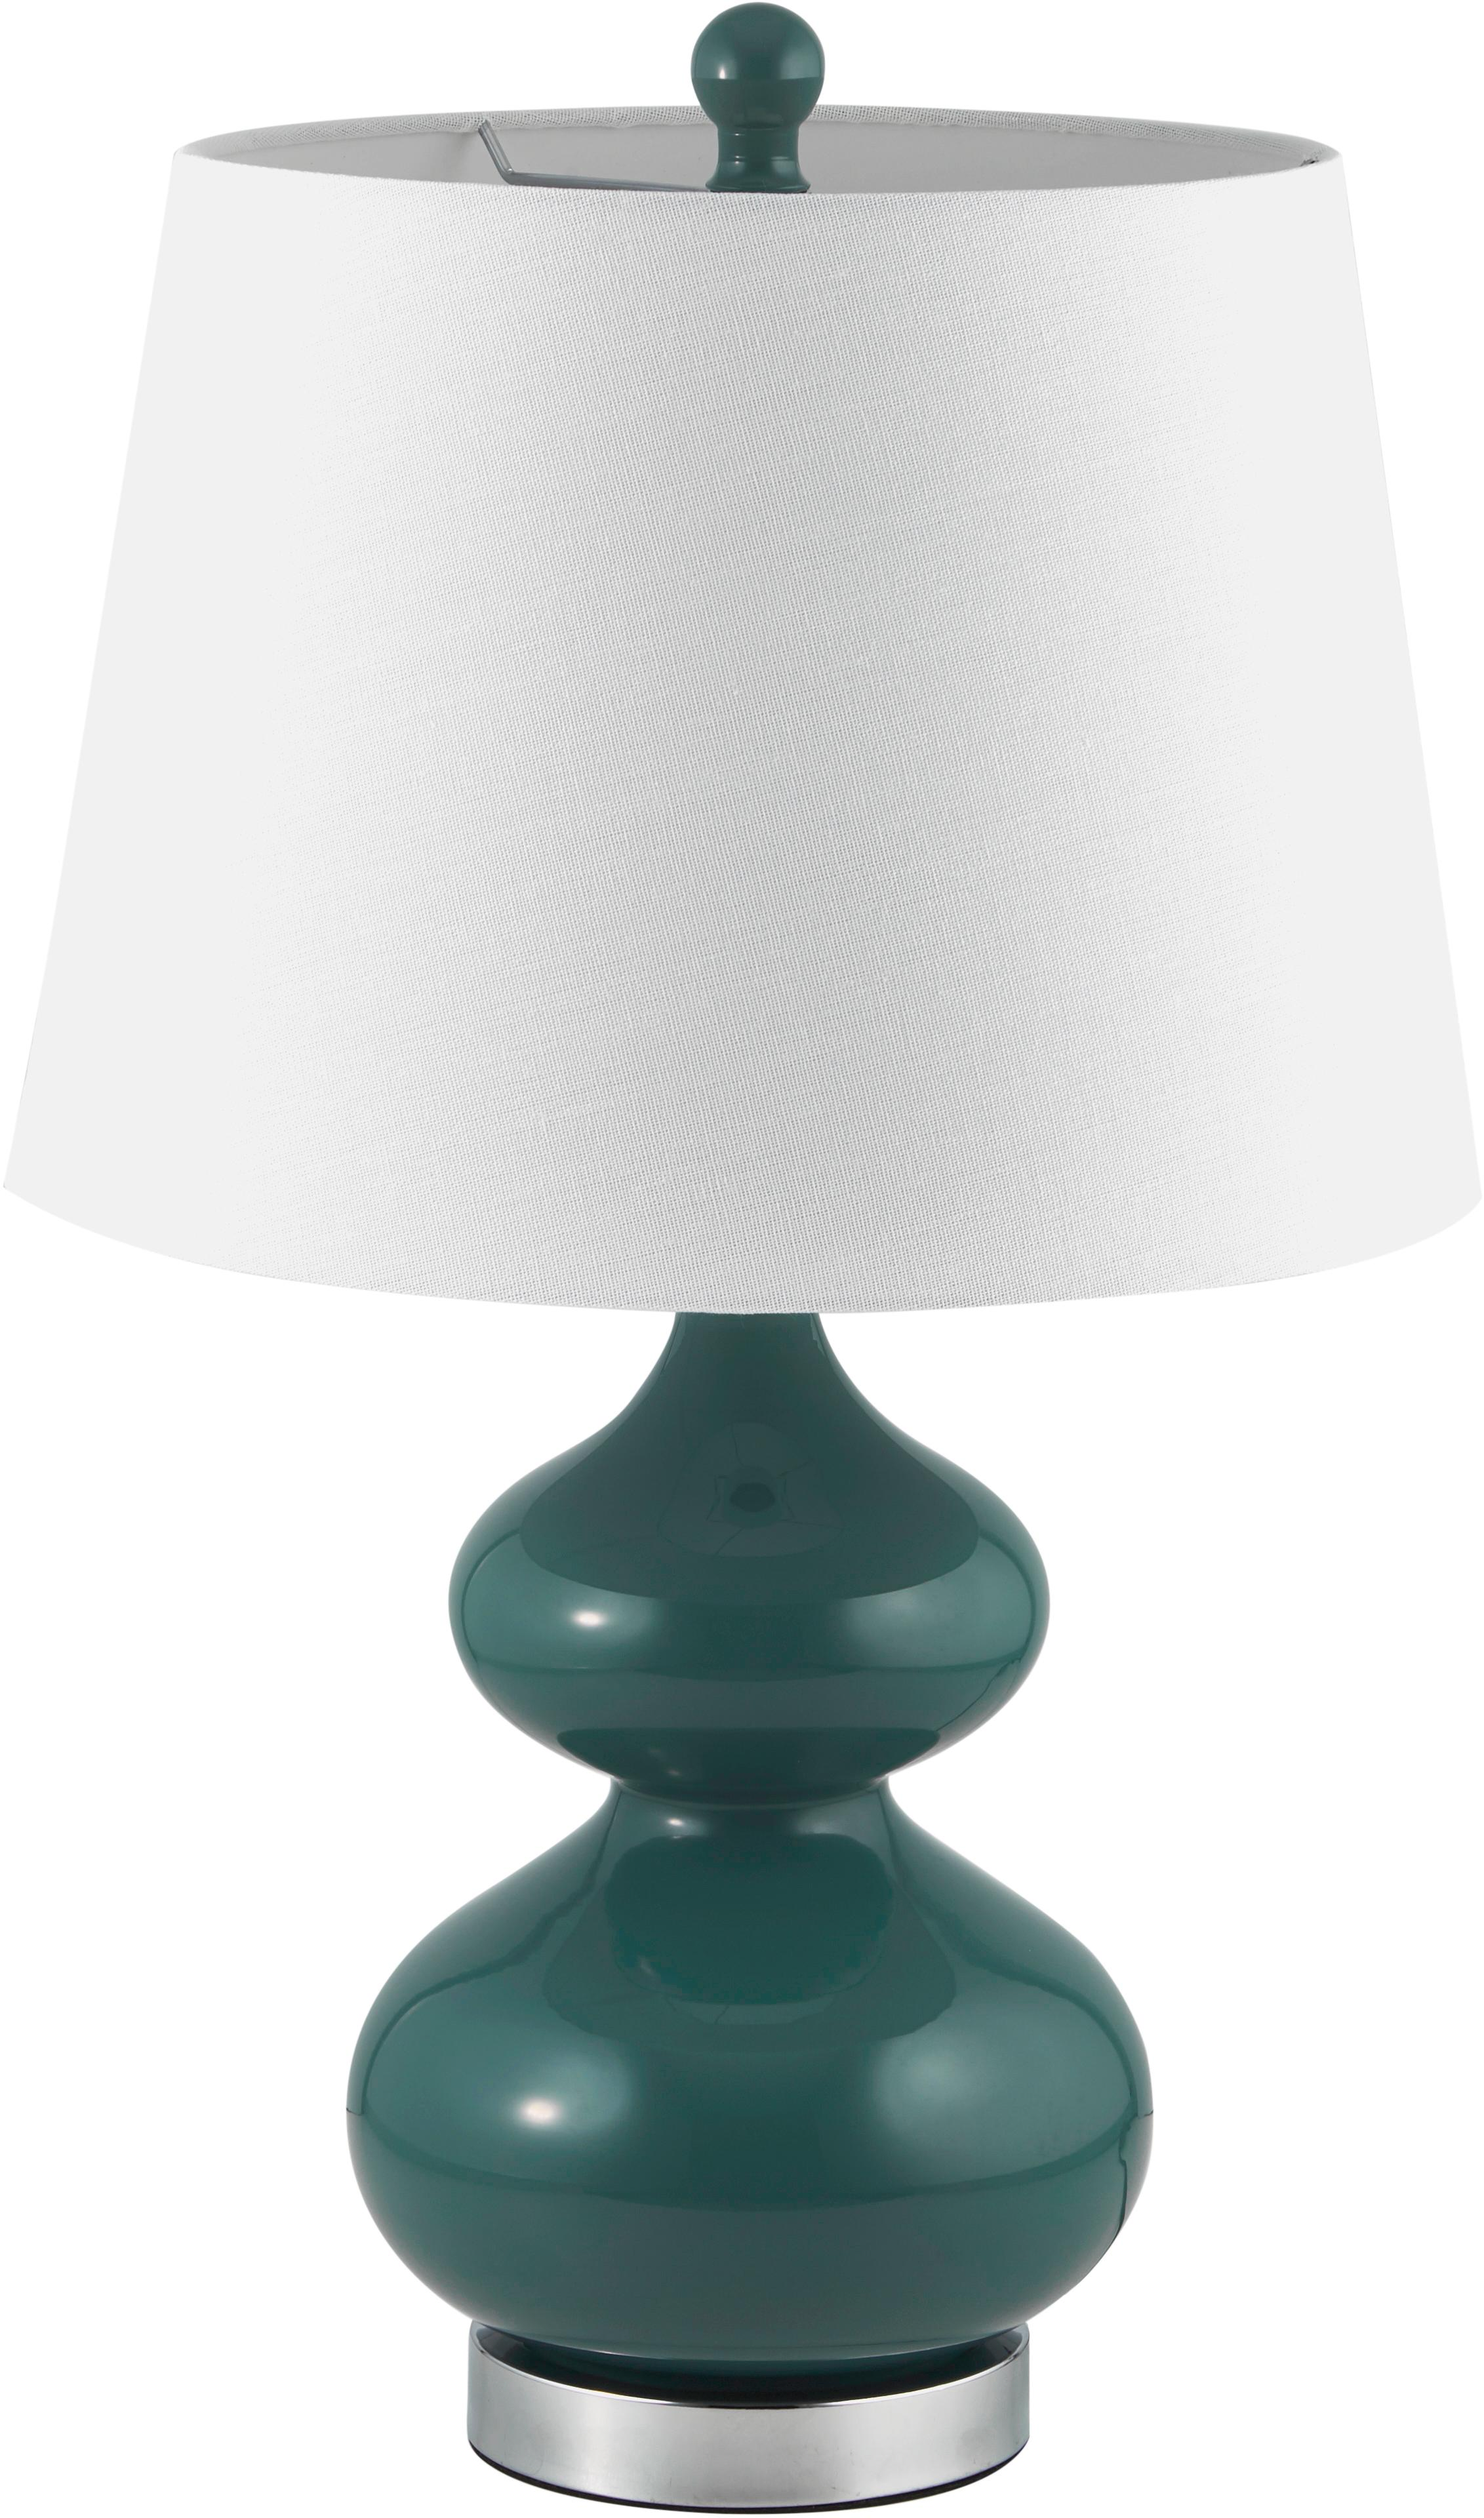 Grosse Tischlampen Felicitas, 2 Stück, Lampenschirm: Baumwolle, Sockel: Metall, Grün, Ø 35 x H 58 cm